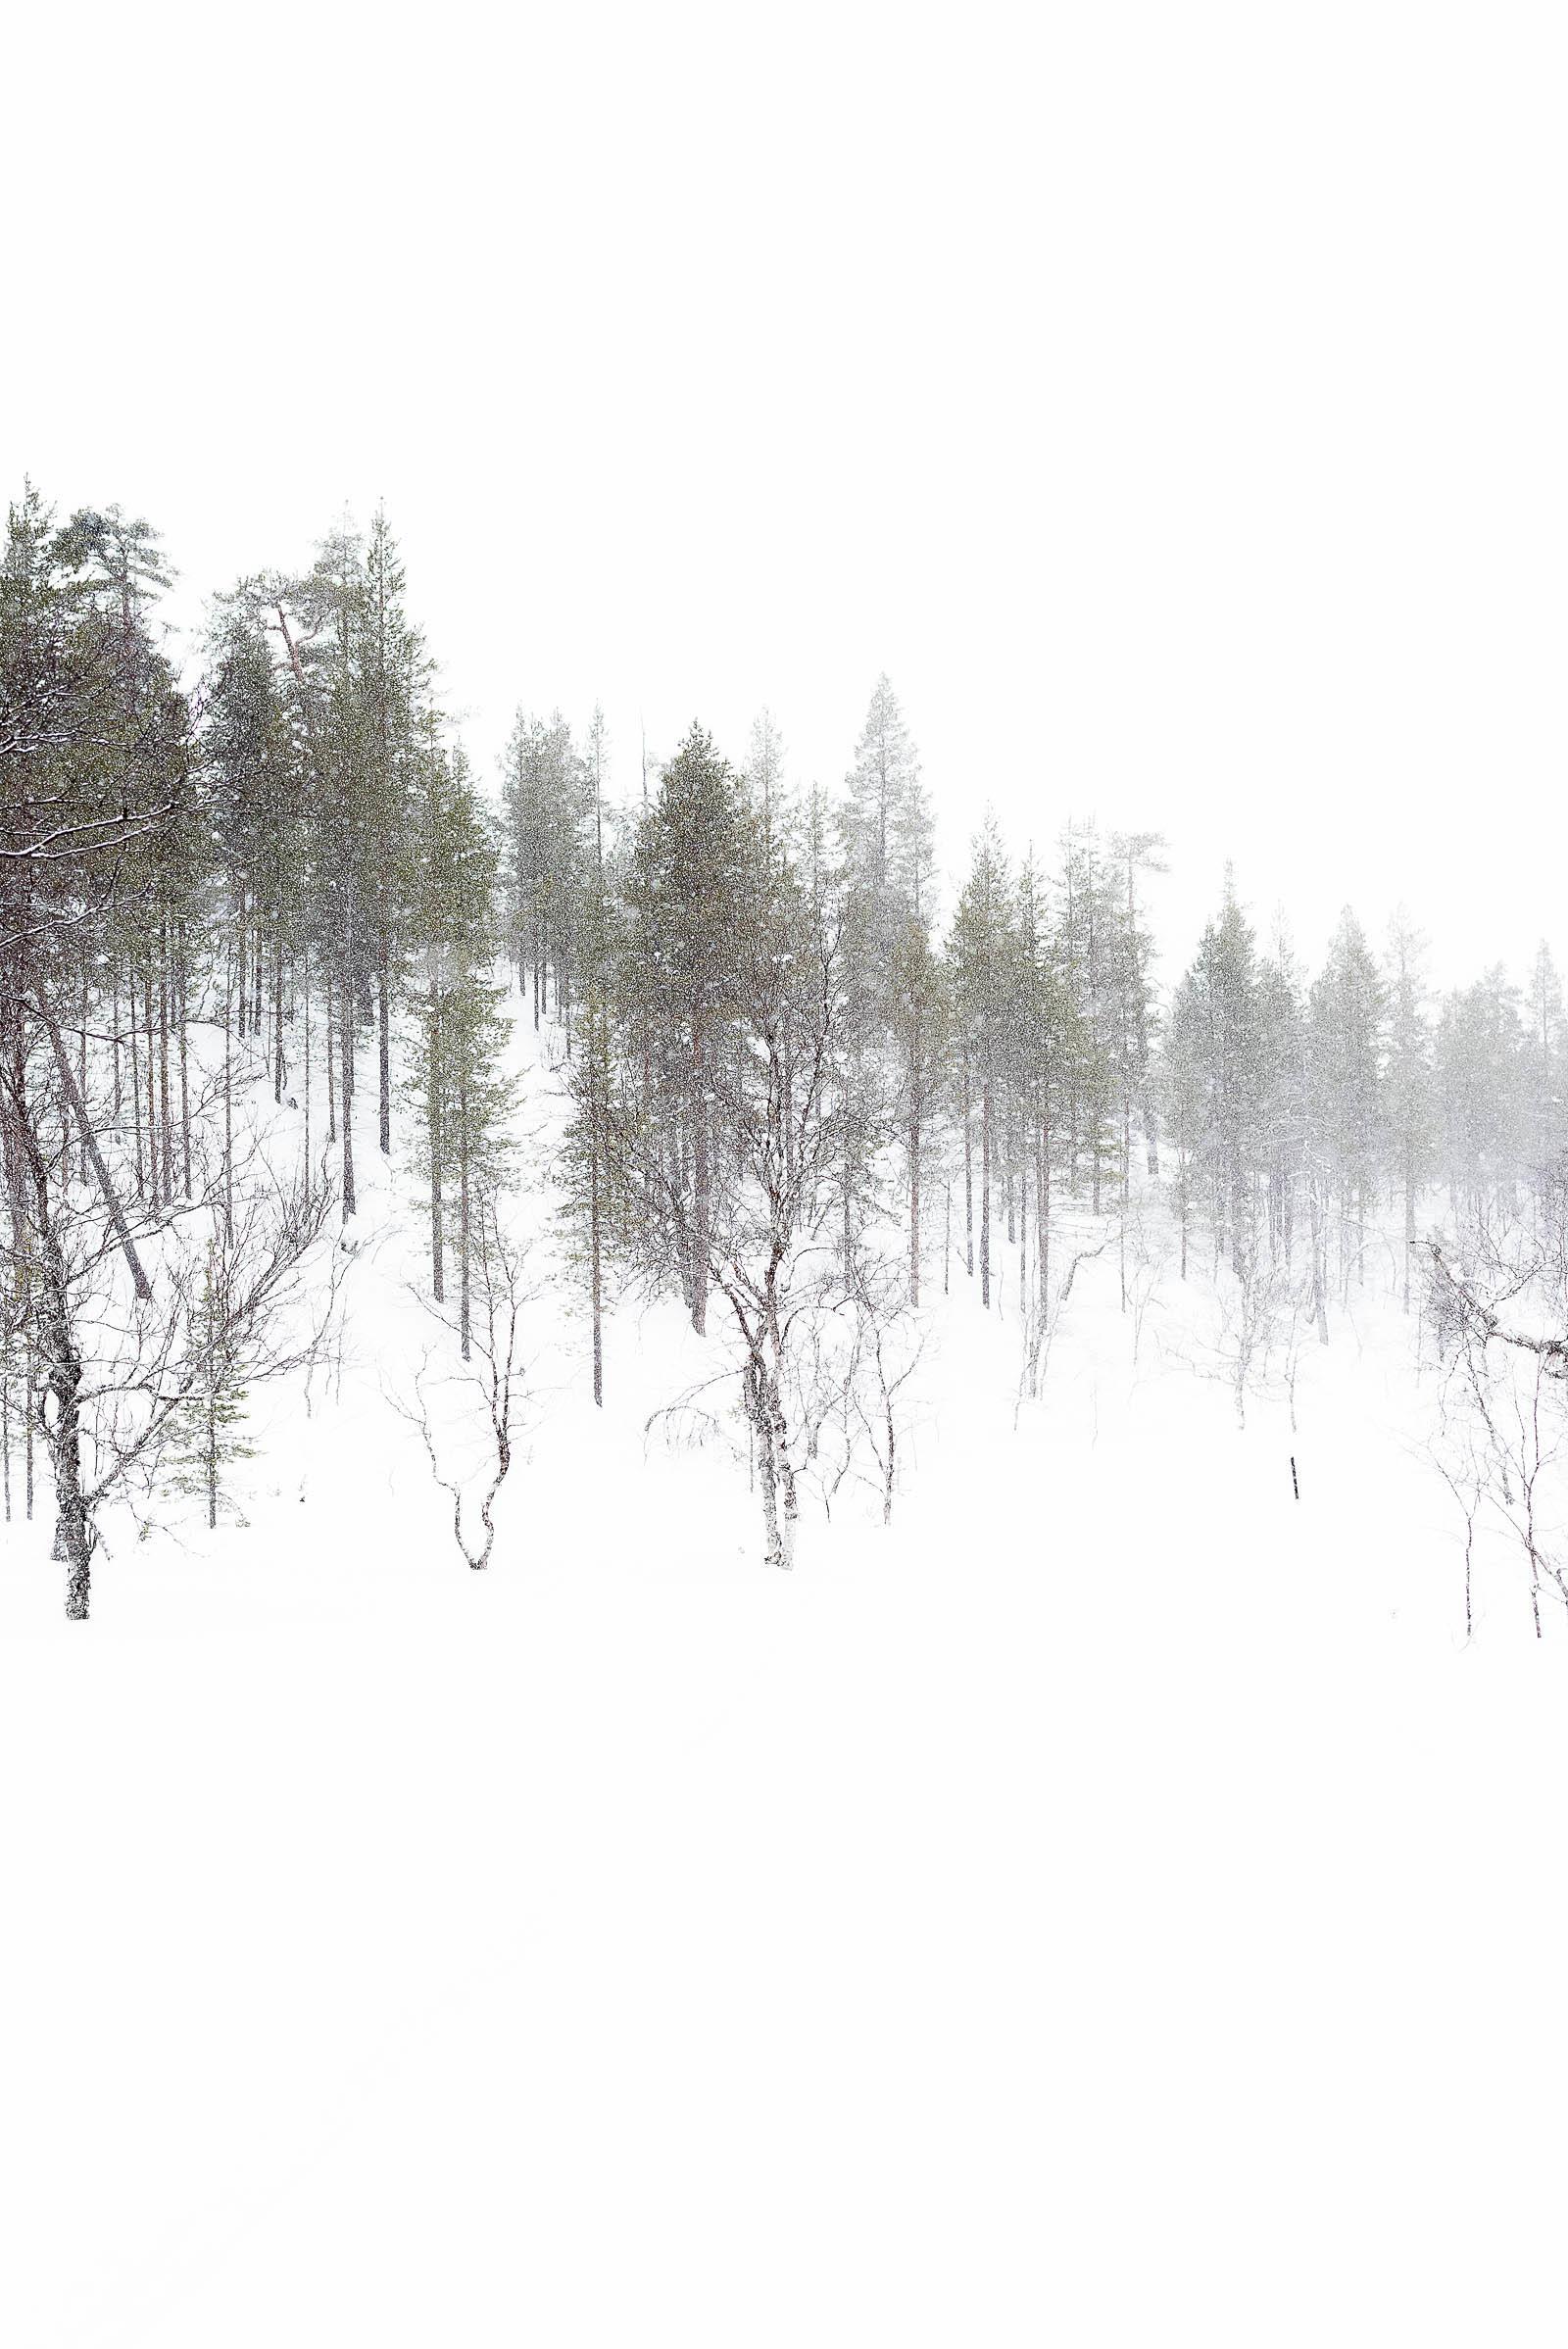 Hotel Riekonlinna Inari Saariselkä Lapland Safaris Finland Snowshoeing